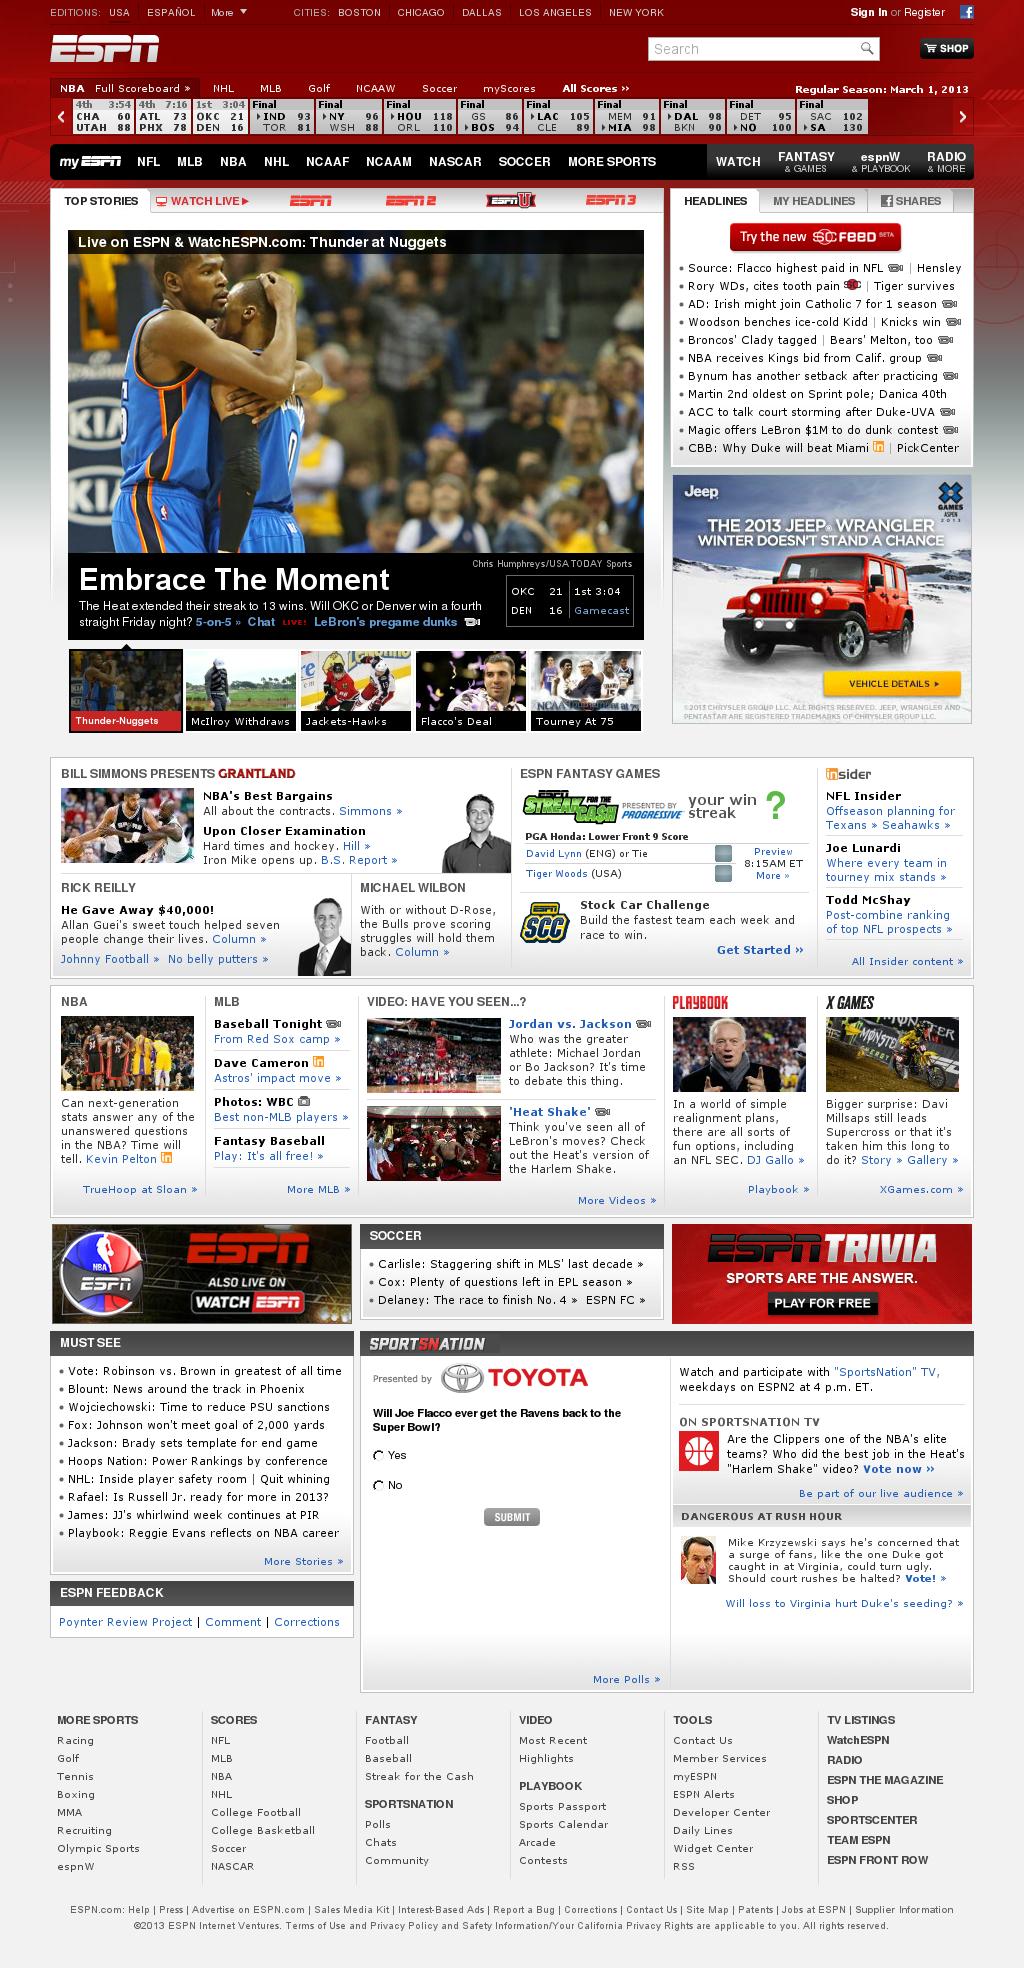 ESPN at Saturday March 2, 2013, 4:05 a.m. UTC